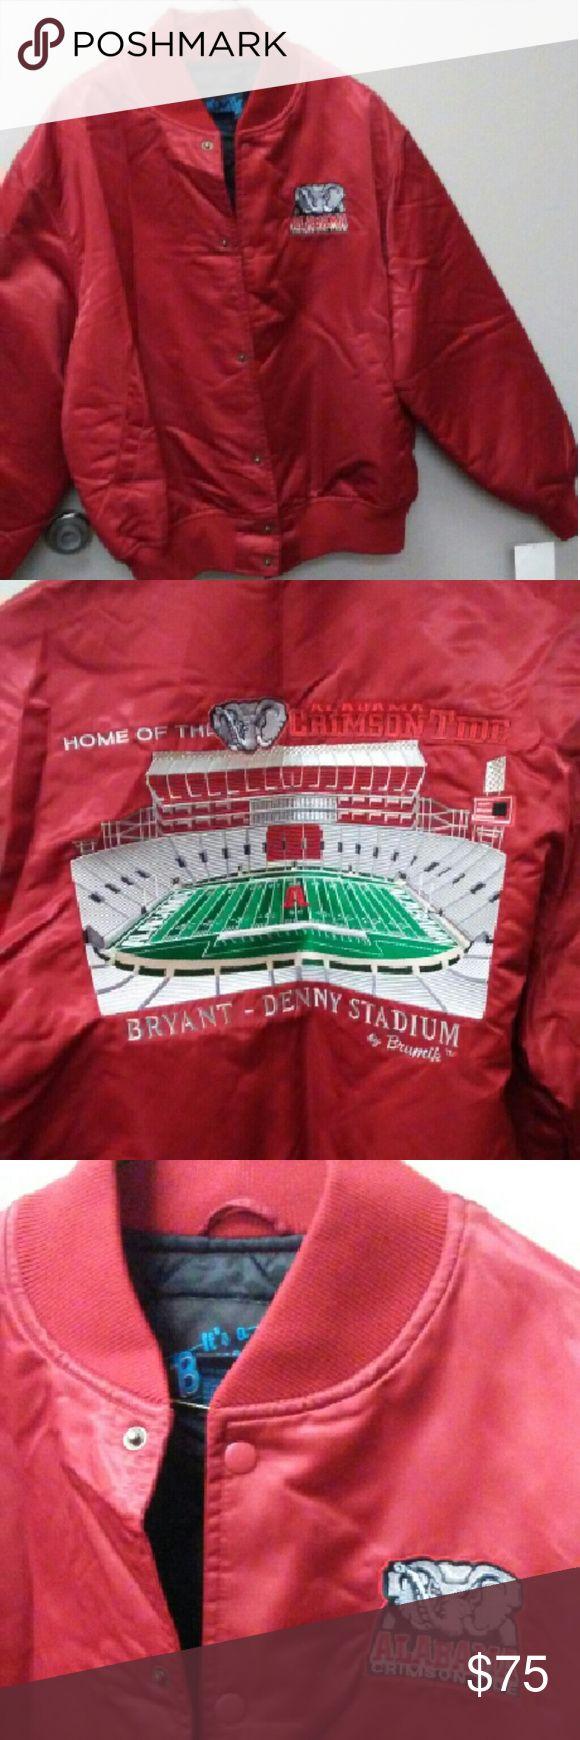 Nwt Alabama Crimson Tide jacket Neat stadium and team SEC championship jacket. Alabama has years of success in college football.  Awesome jacket??? Alabama. SEC Jackets & Coats